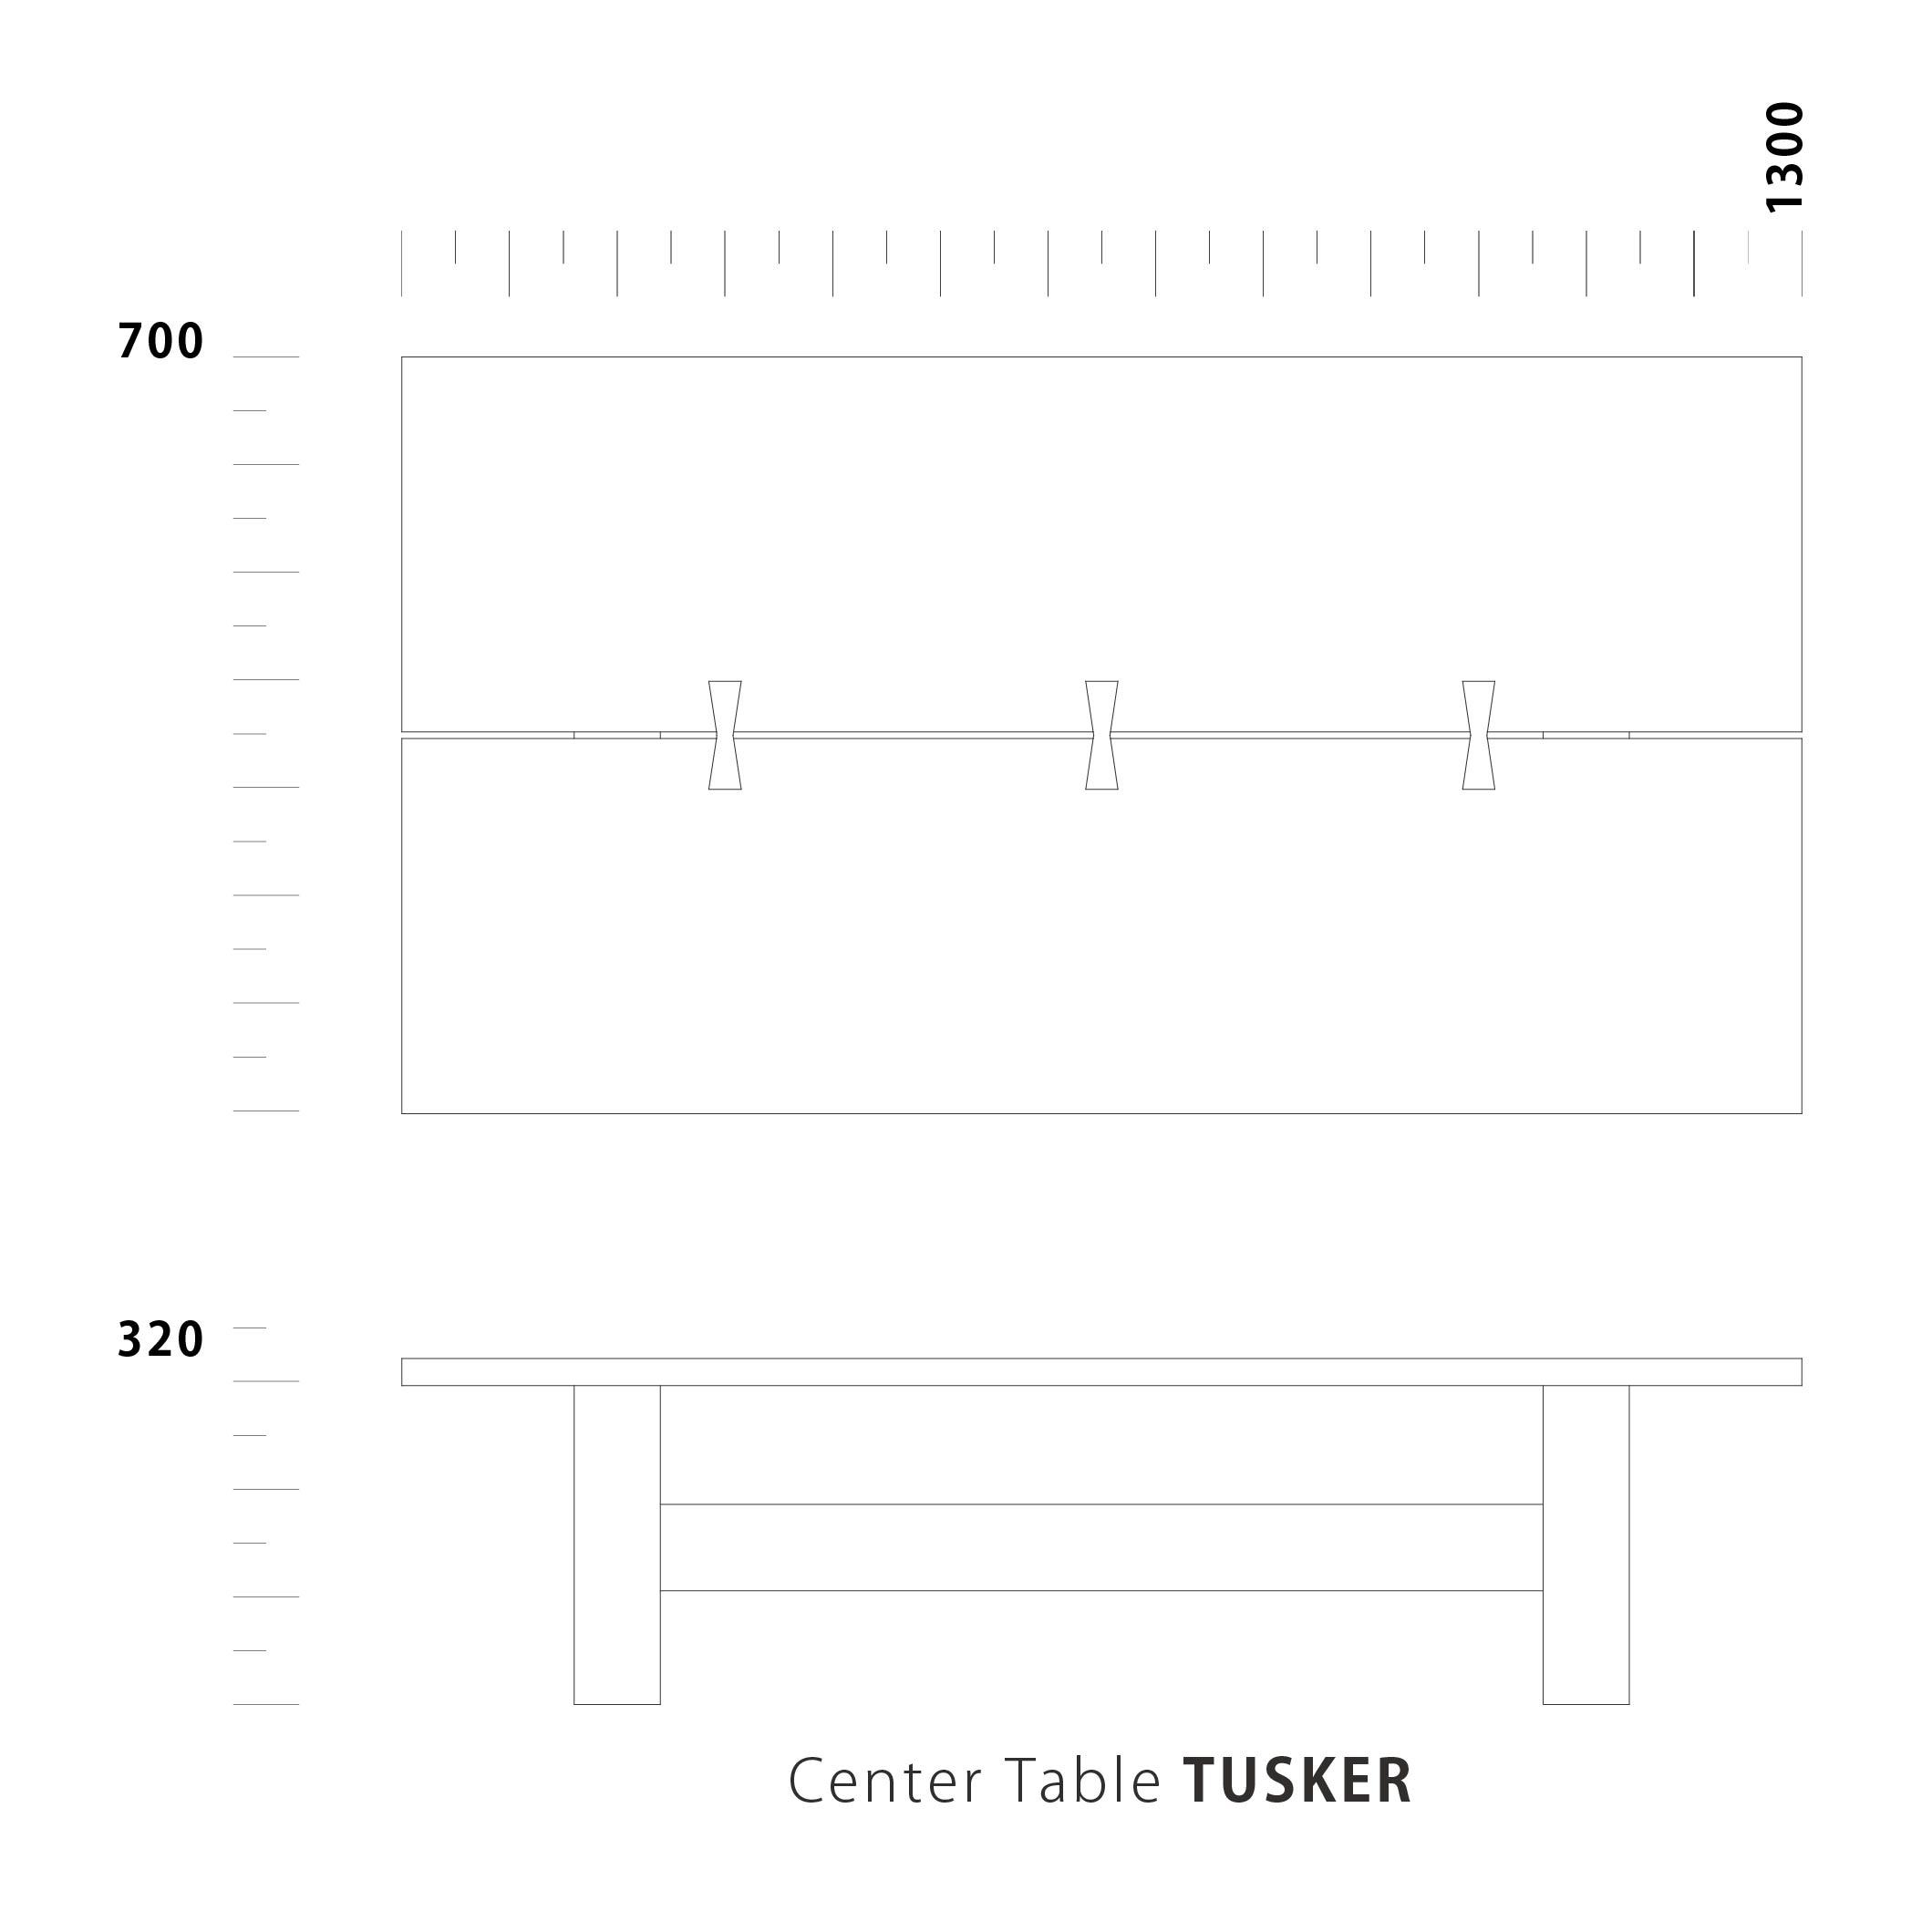 Center Table TUSKER